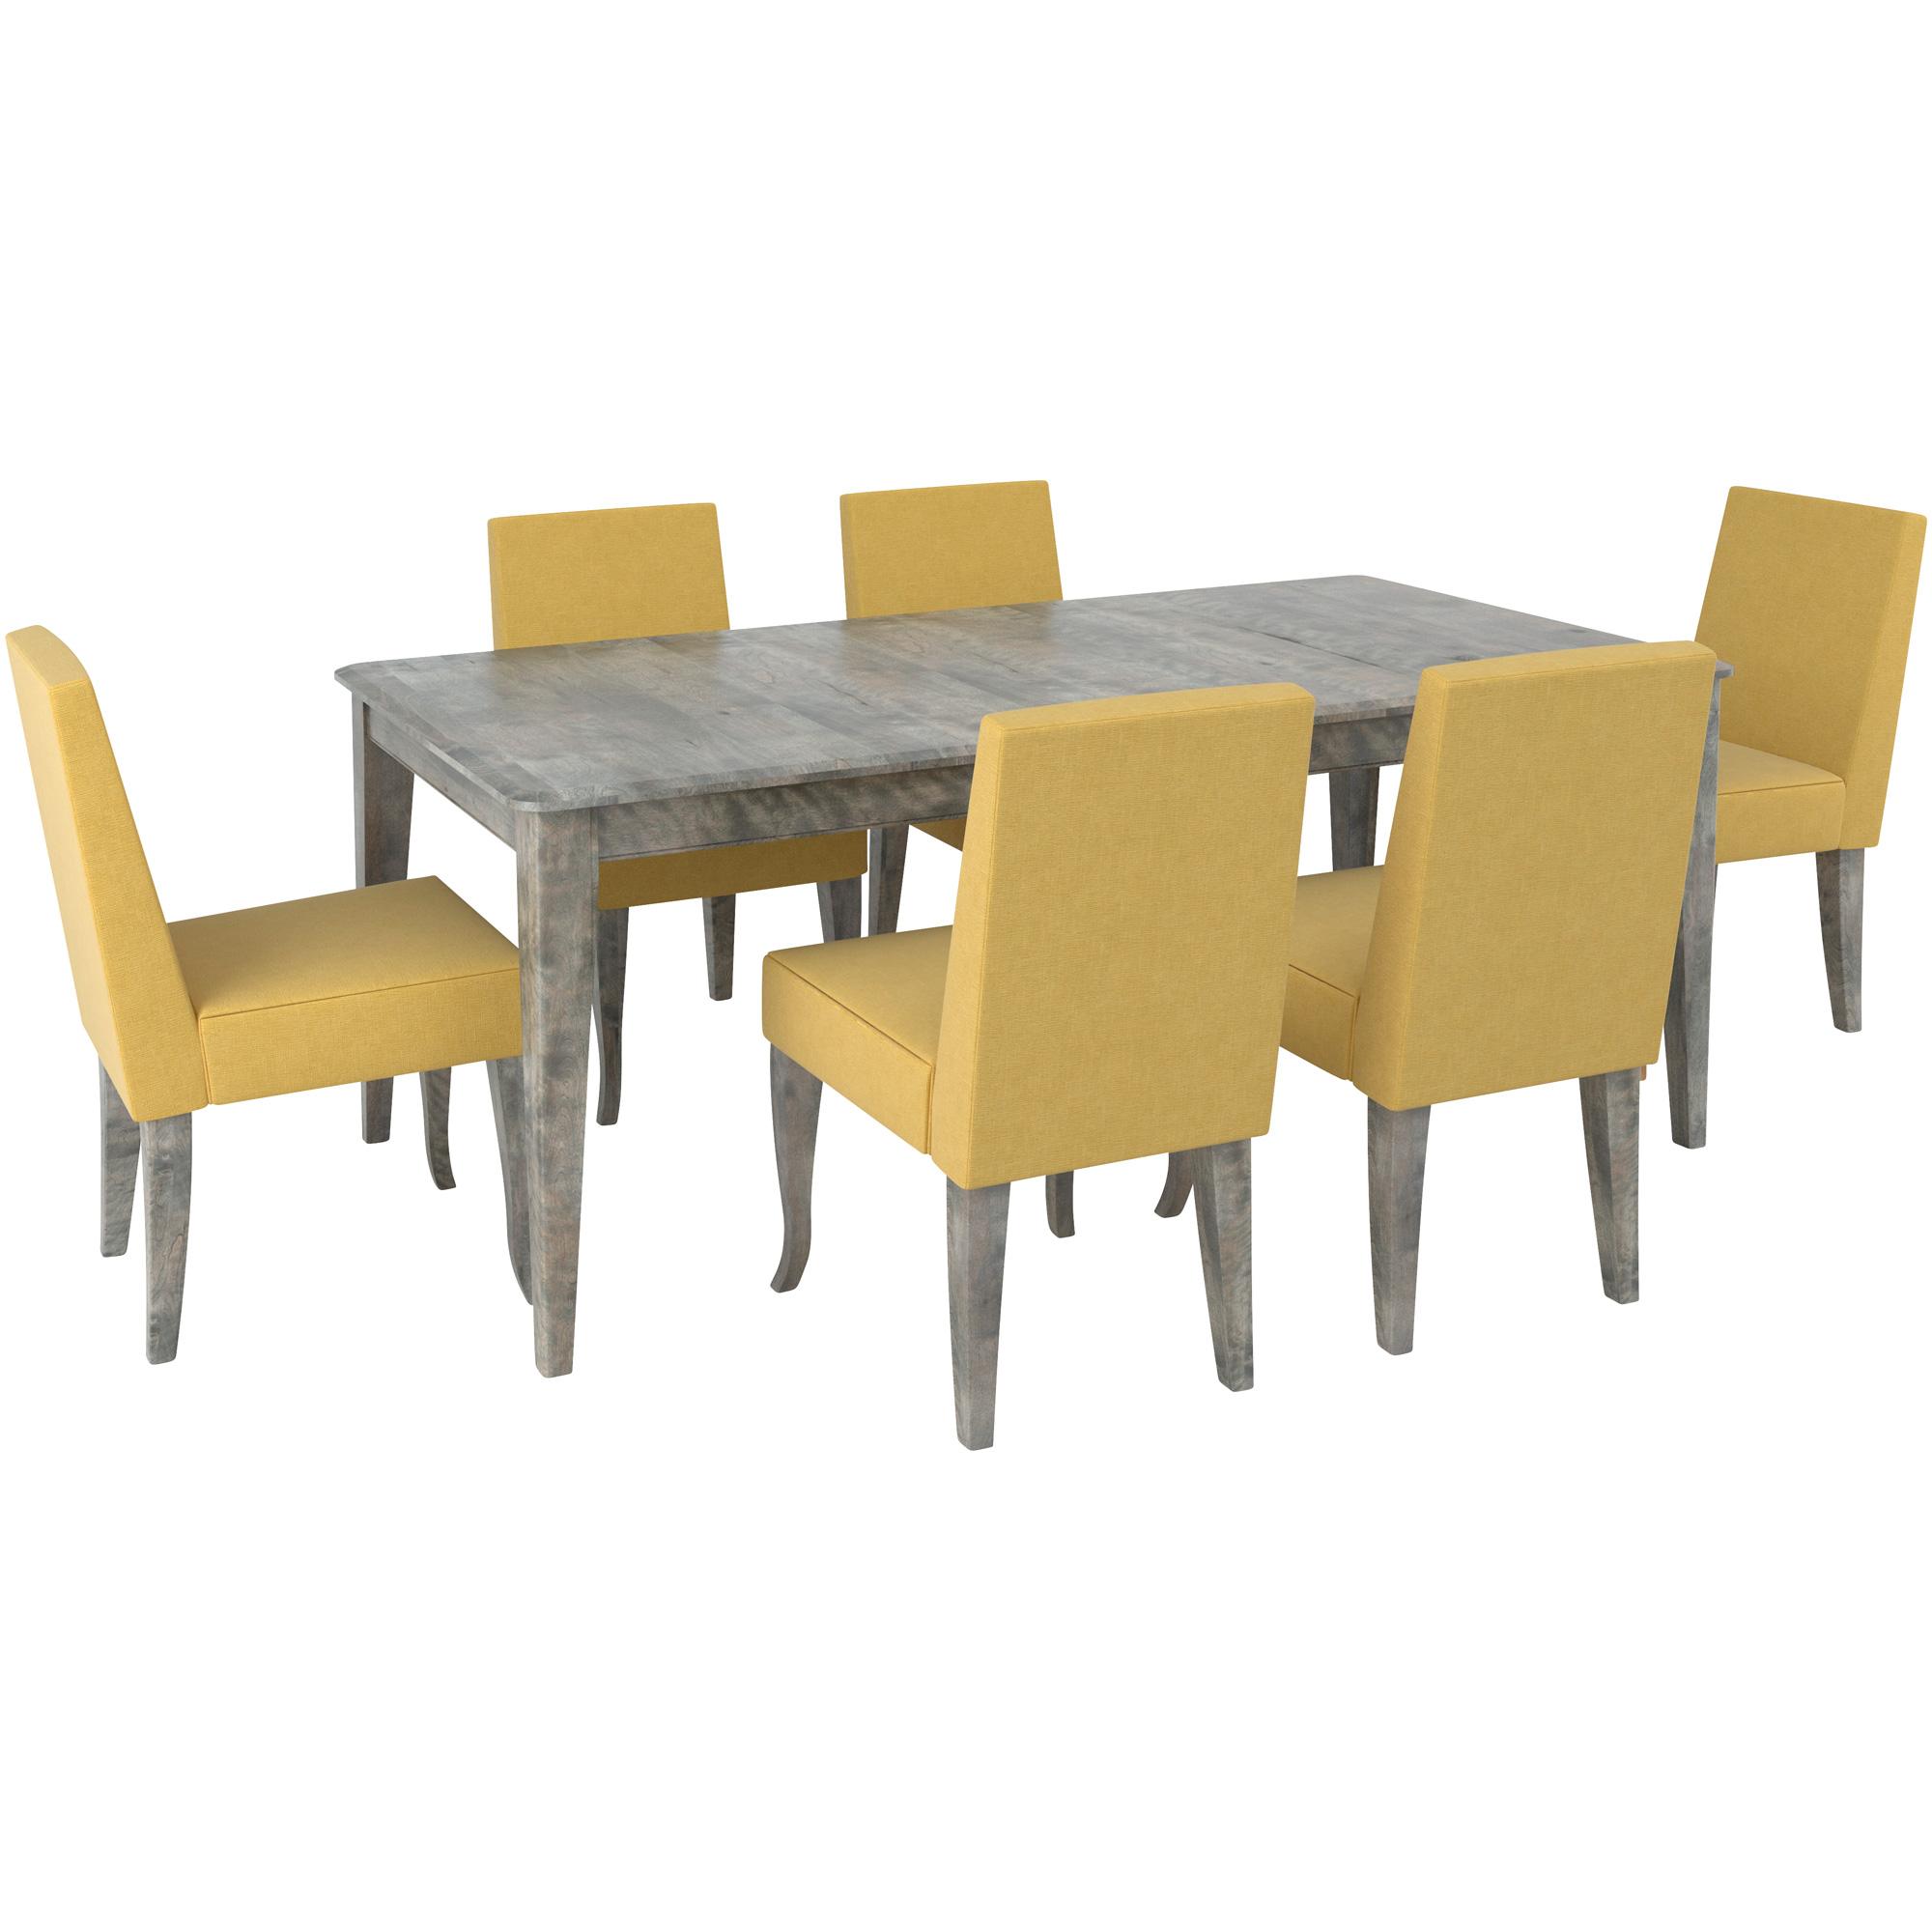 Canadel Furniture | Malibu Yellow 5 Piece Dining Set